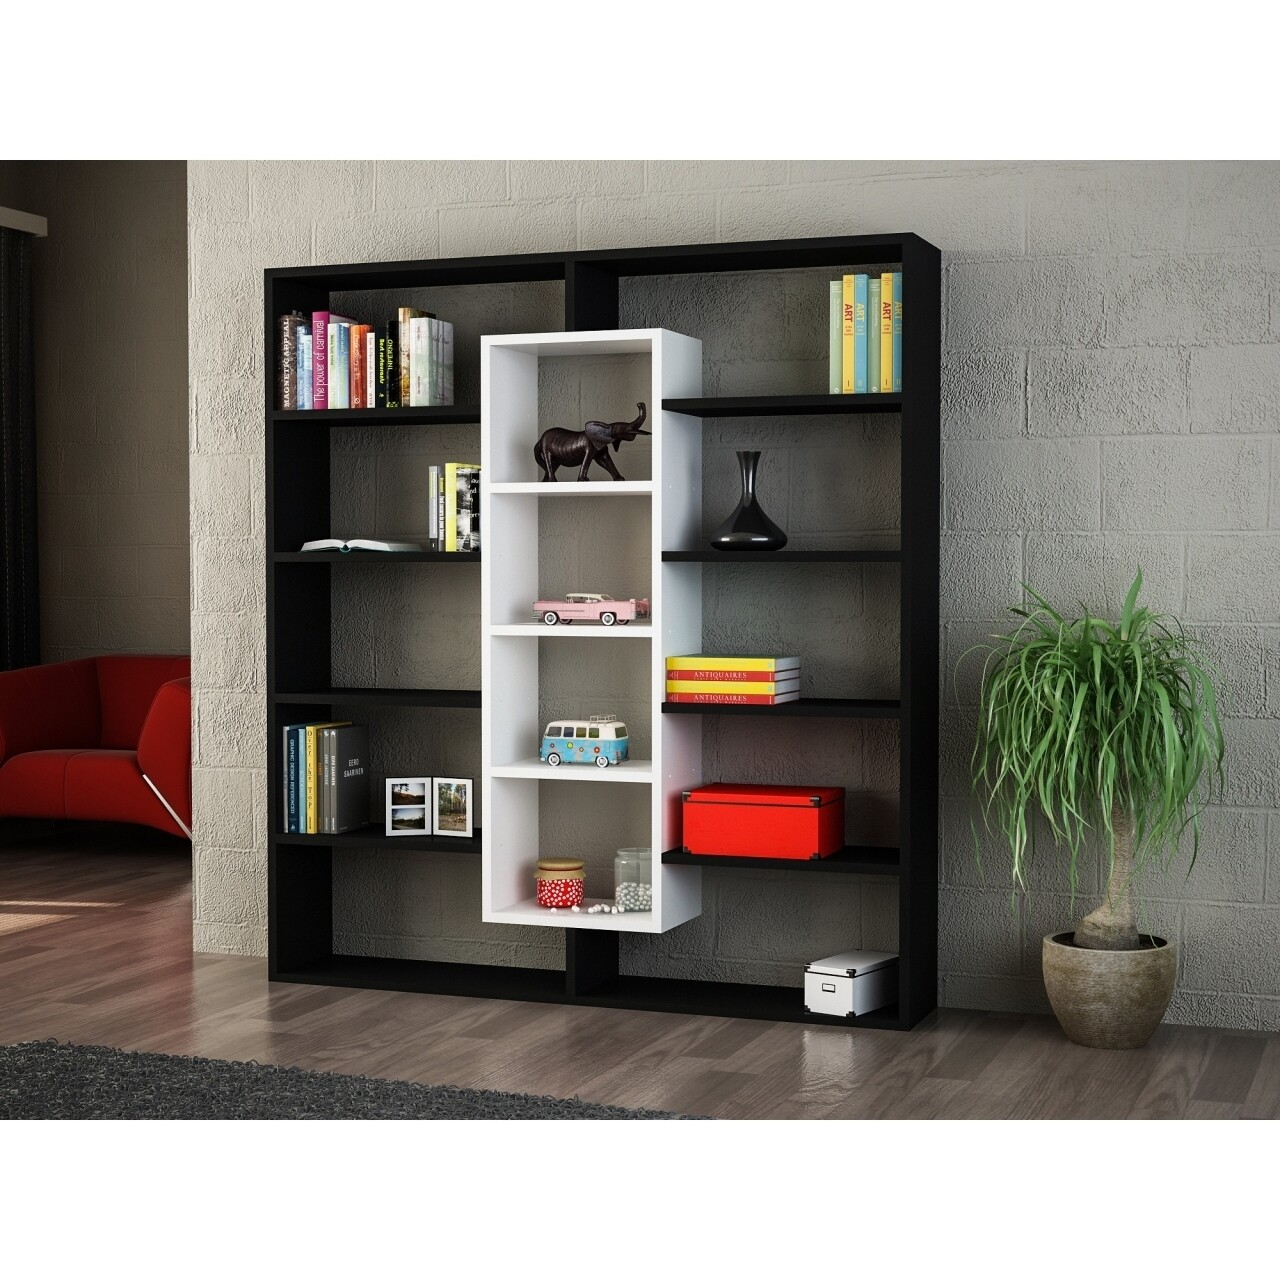 Biblioteca Wooden Art, Ample Black White, 125x135.7x22 cm